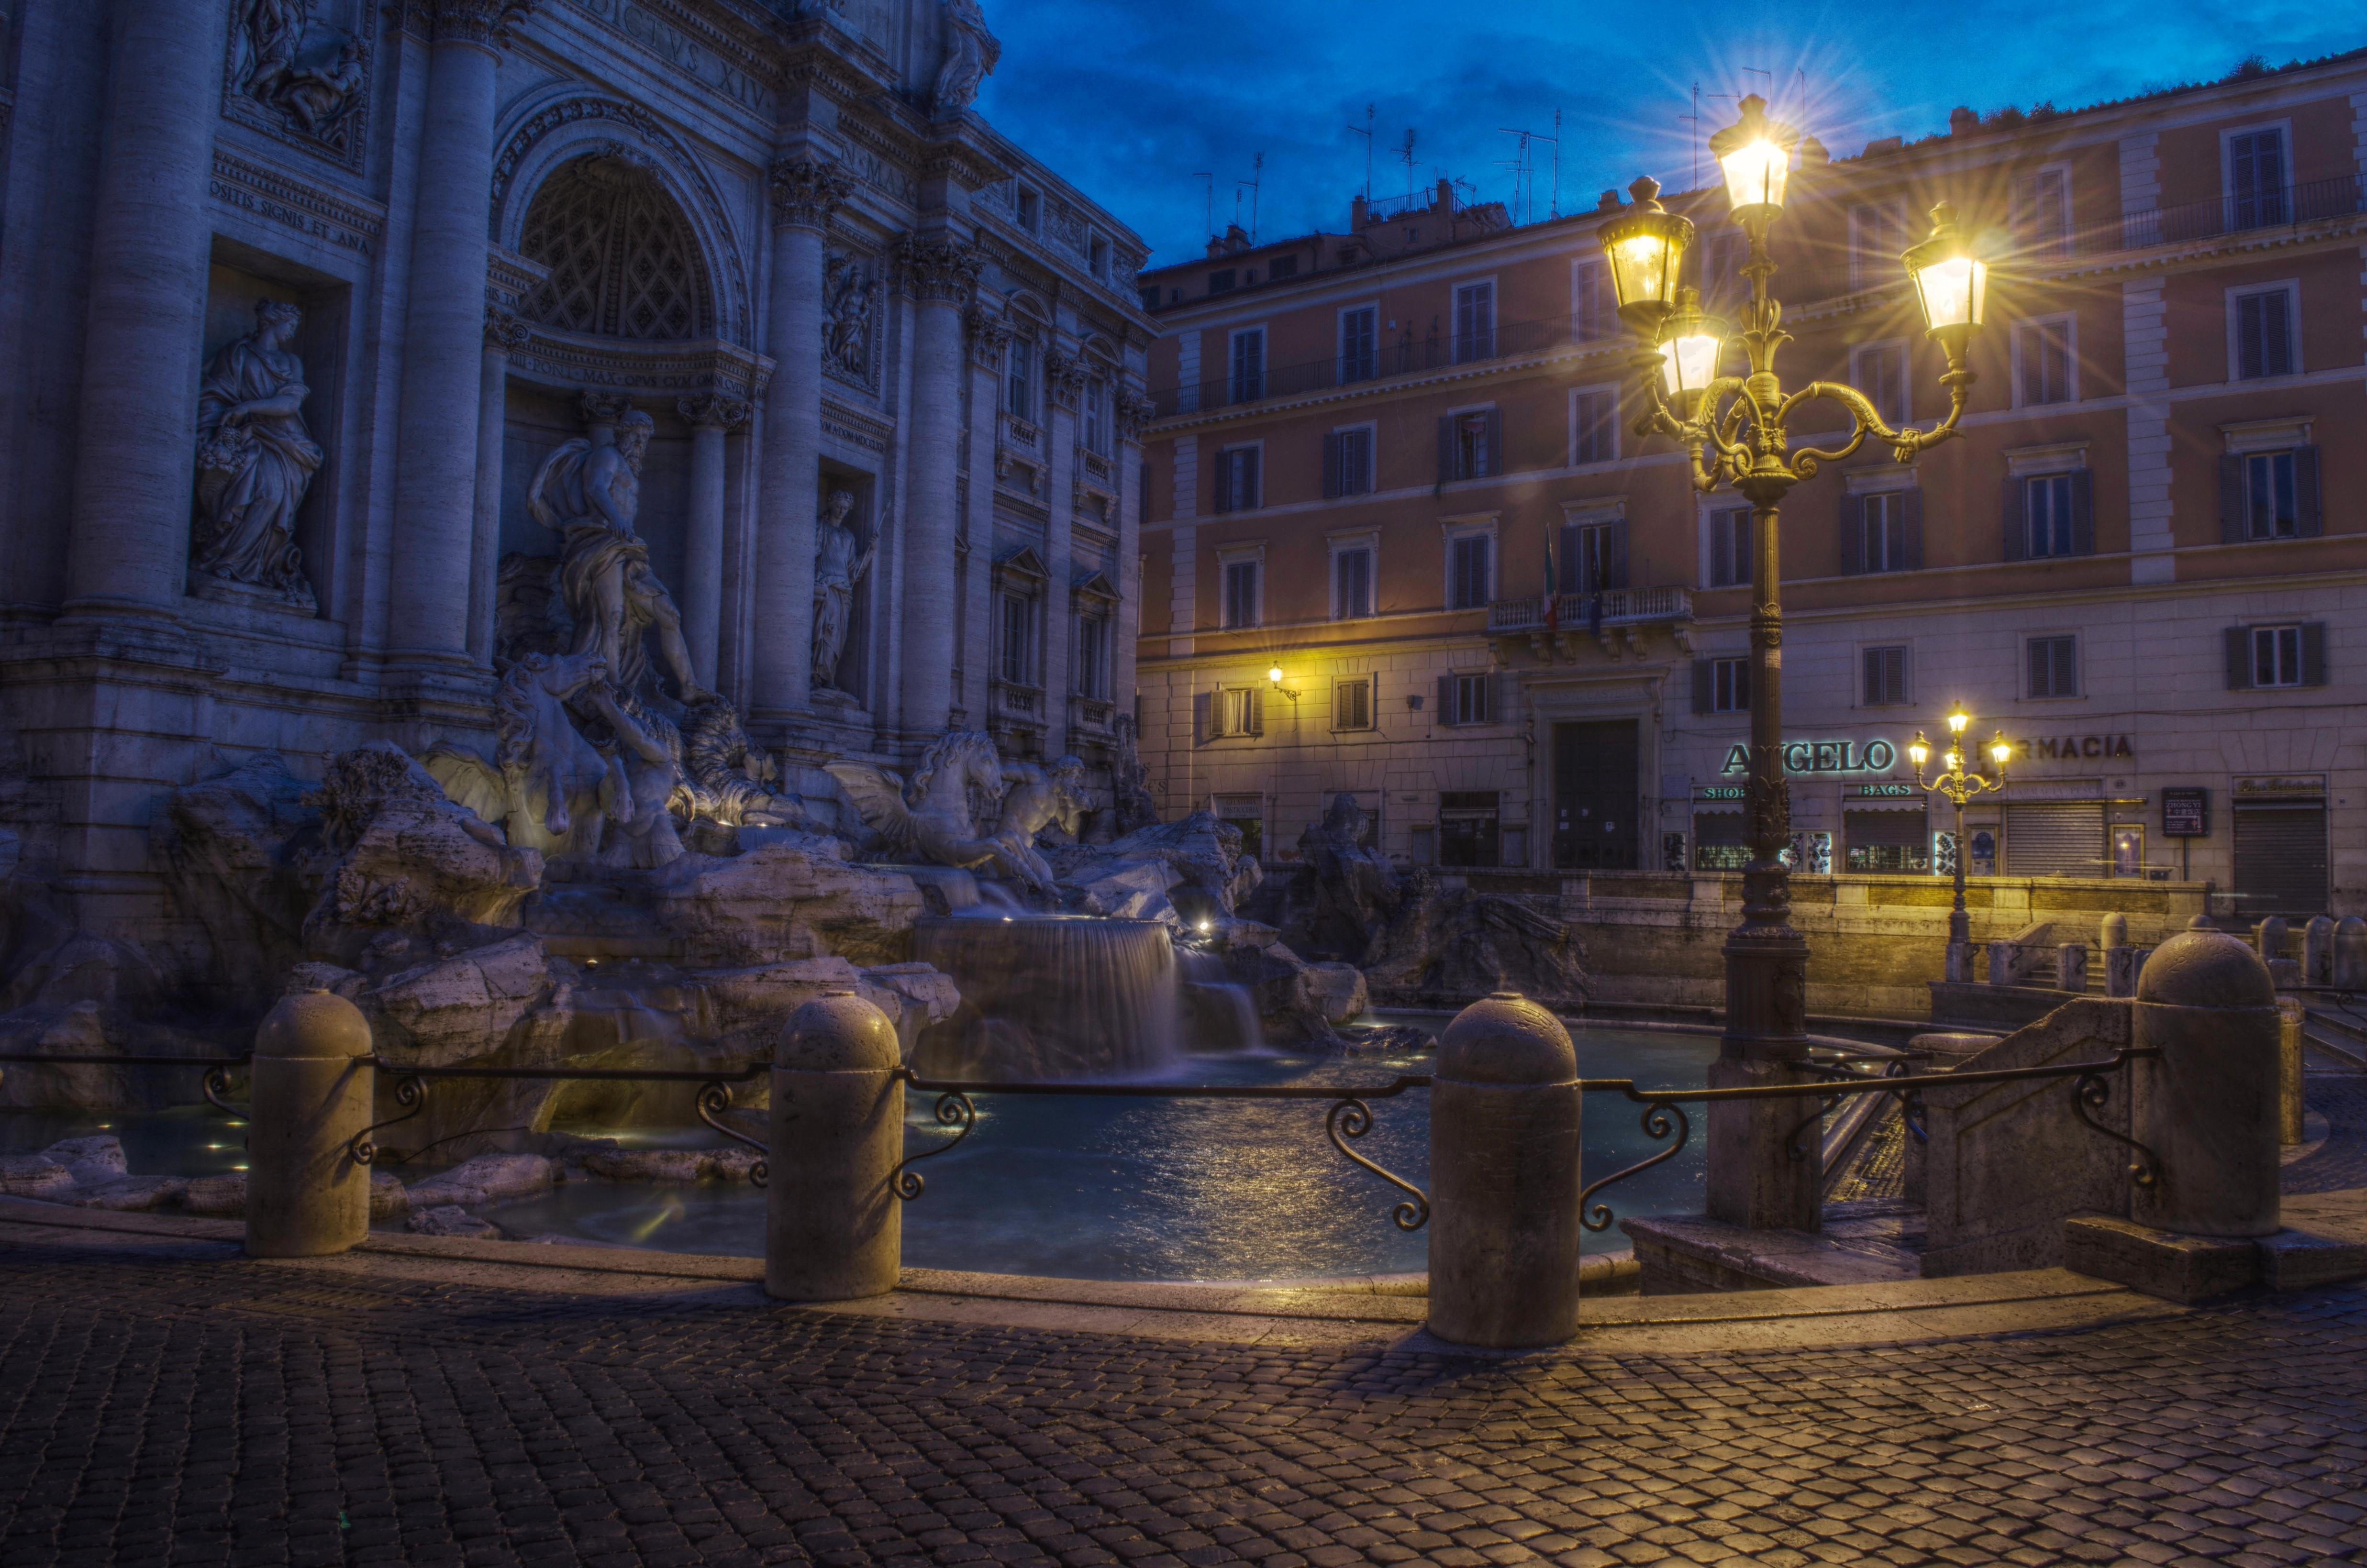 обои Рим, Фонтан Треви, город, ночь картинки фото